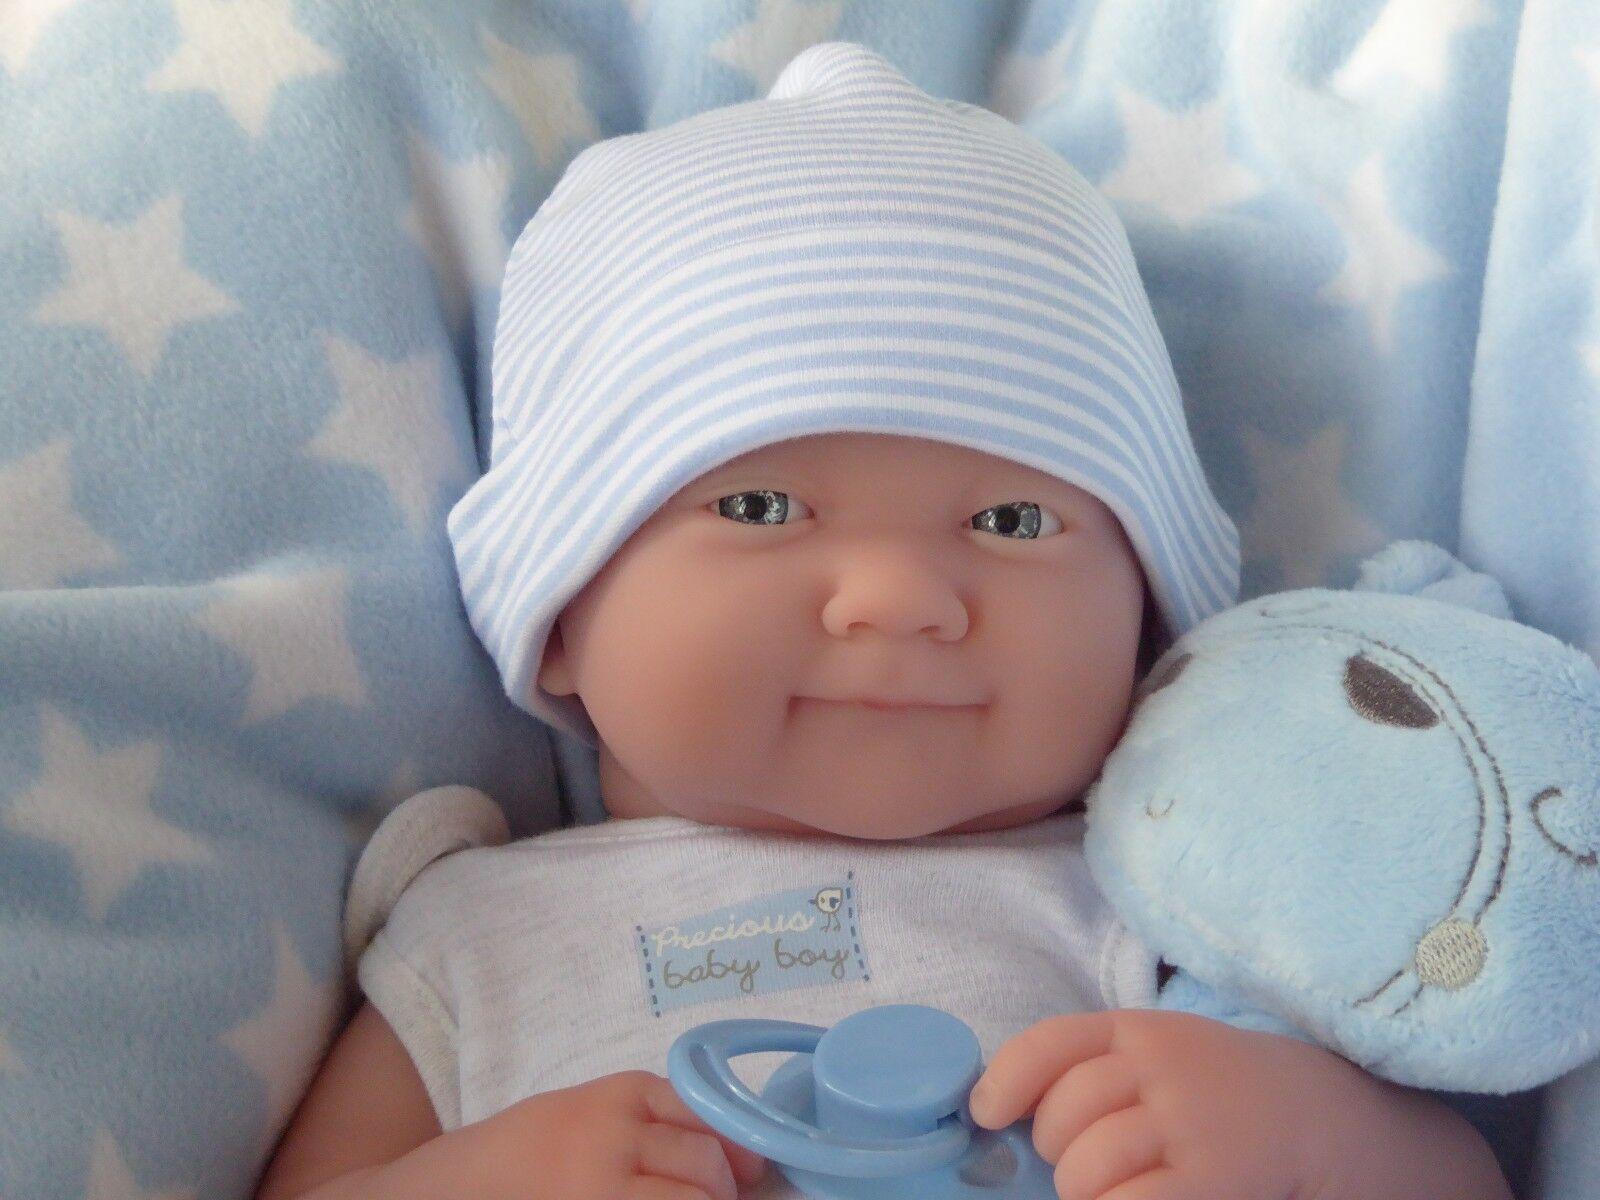 REALISTIC LIFELIKE DOLL   ️  BERENGUER LA NEWBORN REAL BABY BOY REBORN   PLAY